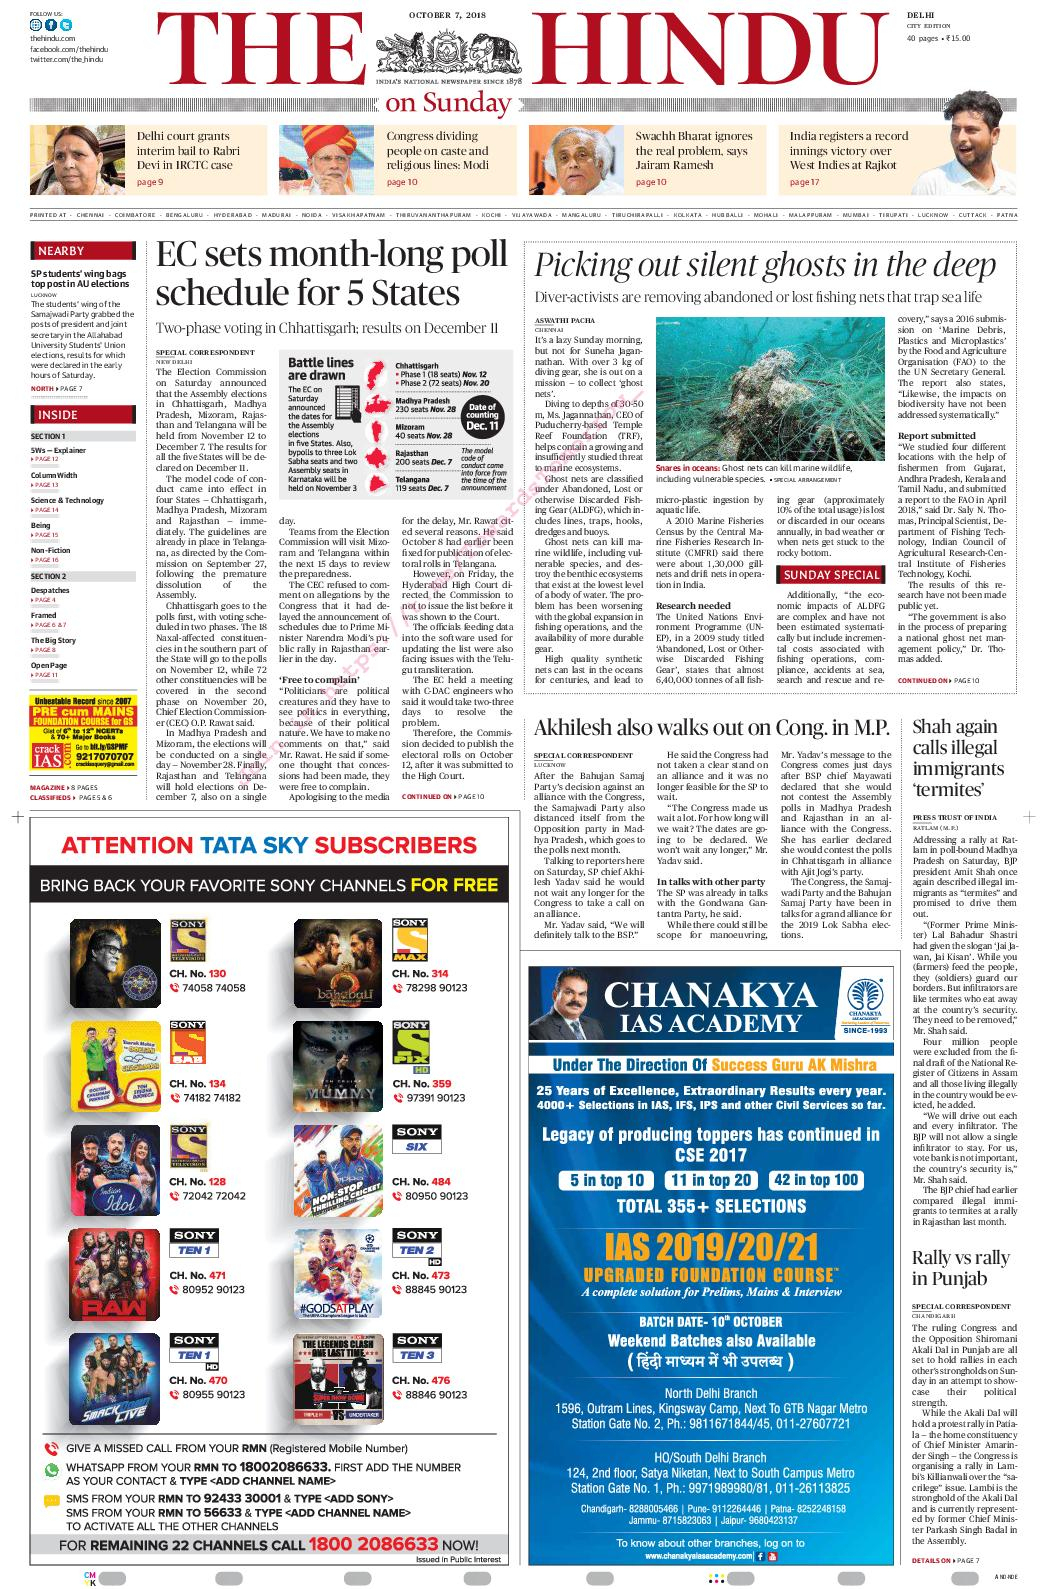 Calaméo - Hindu Complete Set Delhi 2018 10 07 De dedans Sudoku Facile Avec Solution